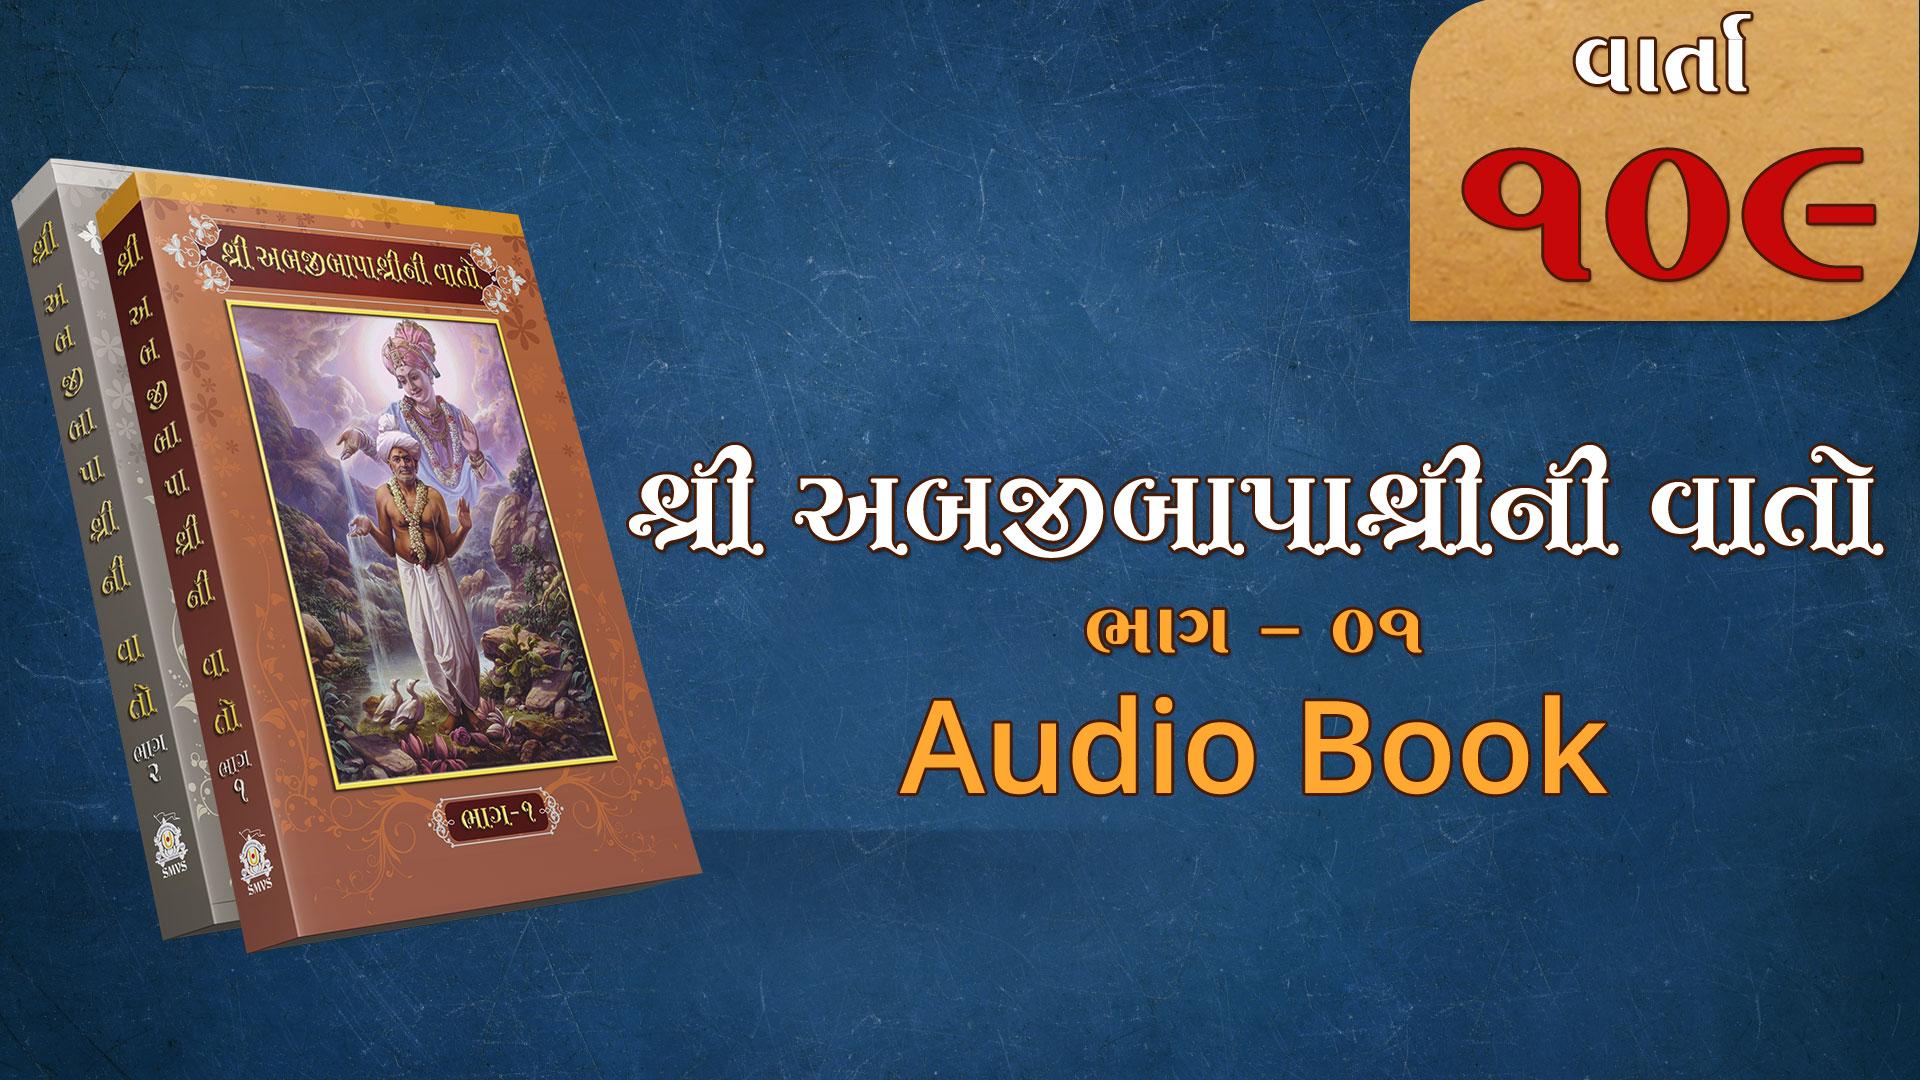 Bapashree Ni Vato | Bhag 1 | Varta 109 | Audio Book